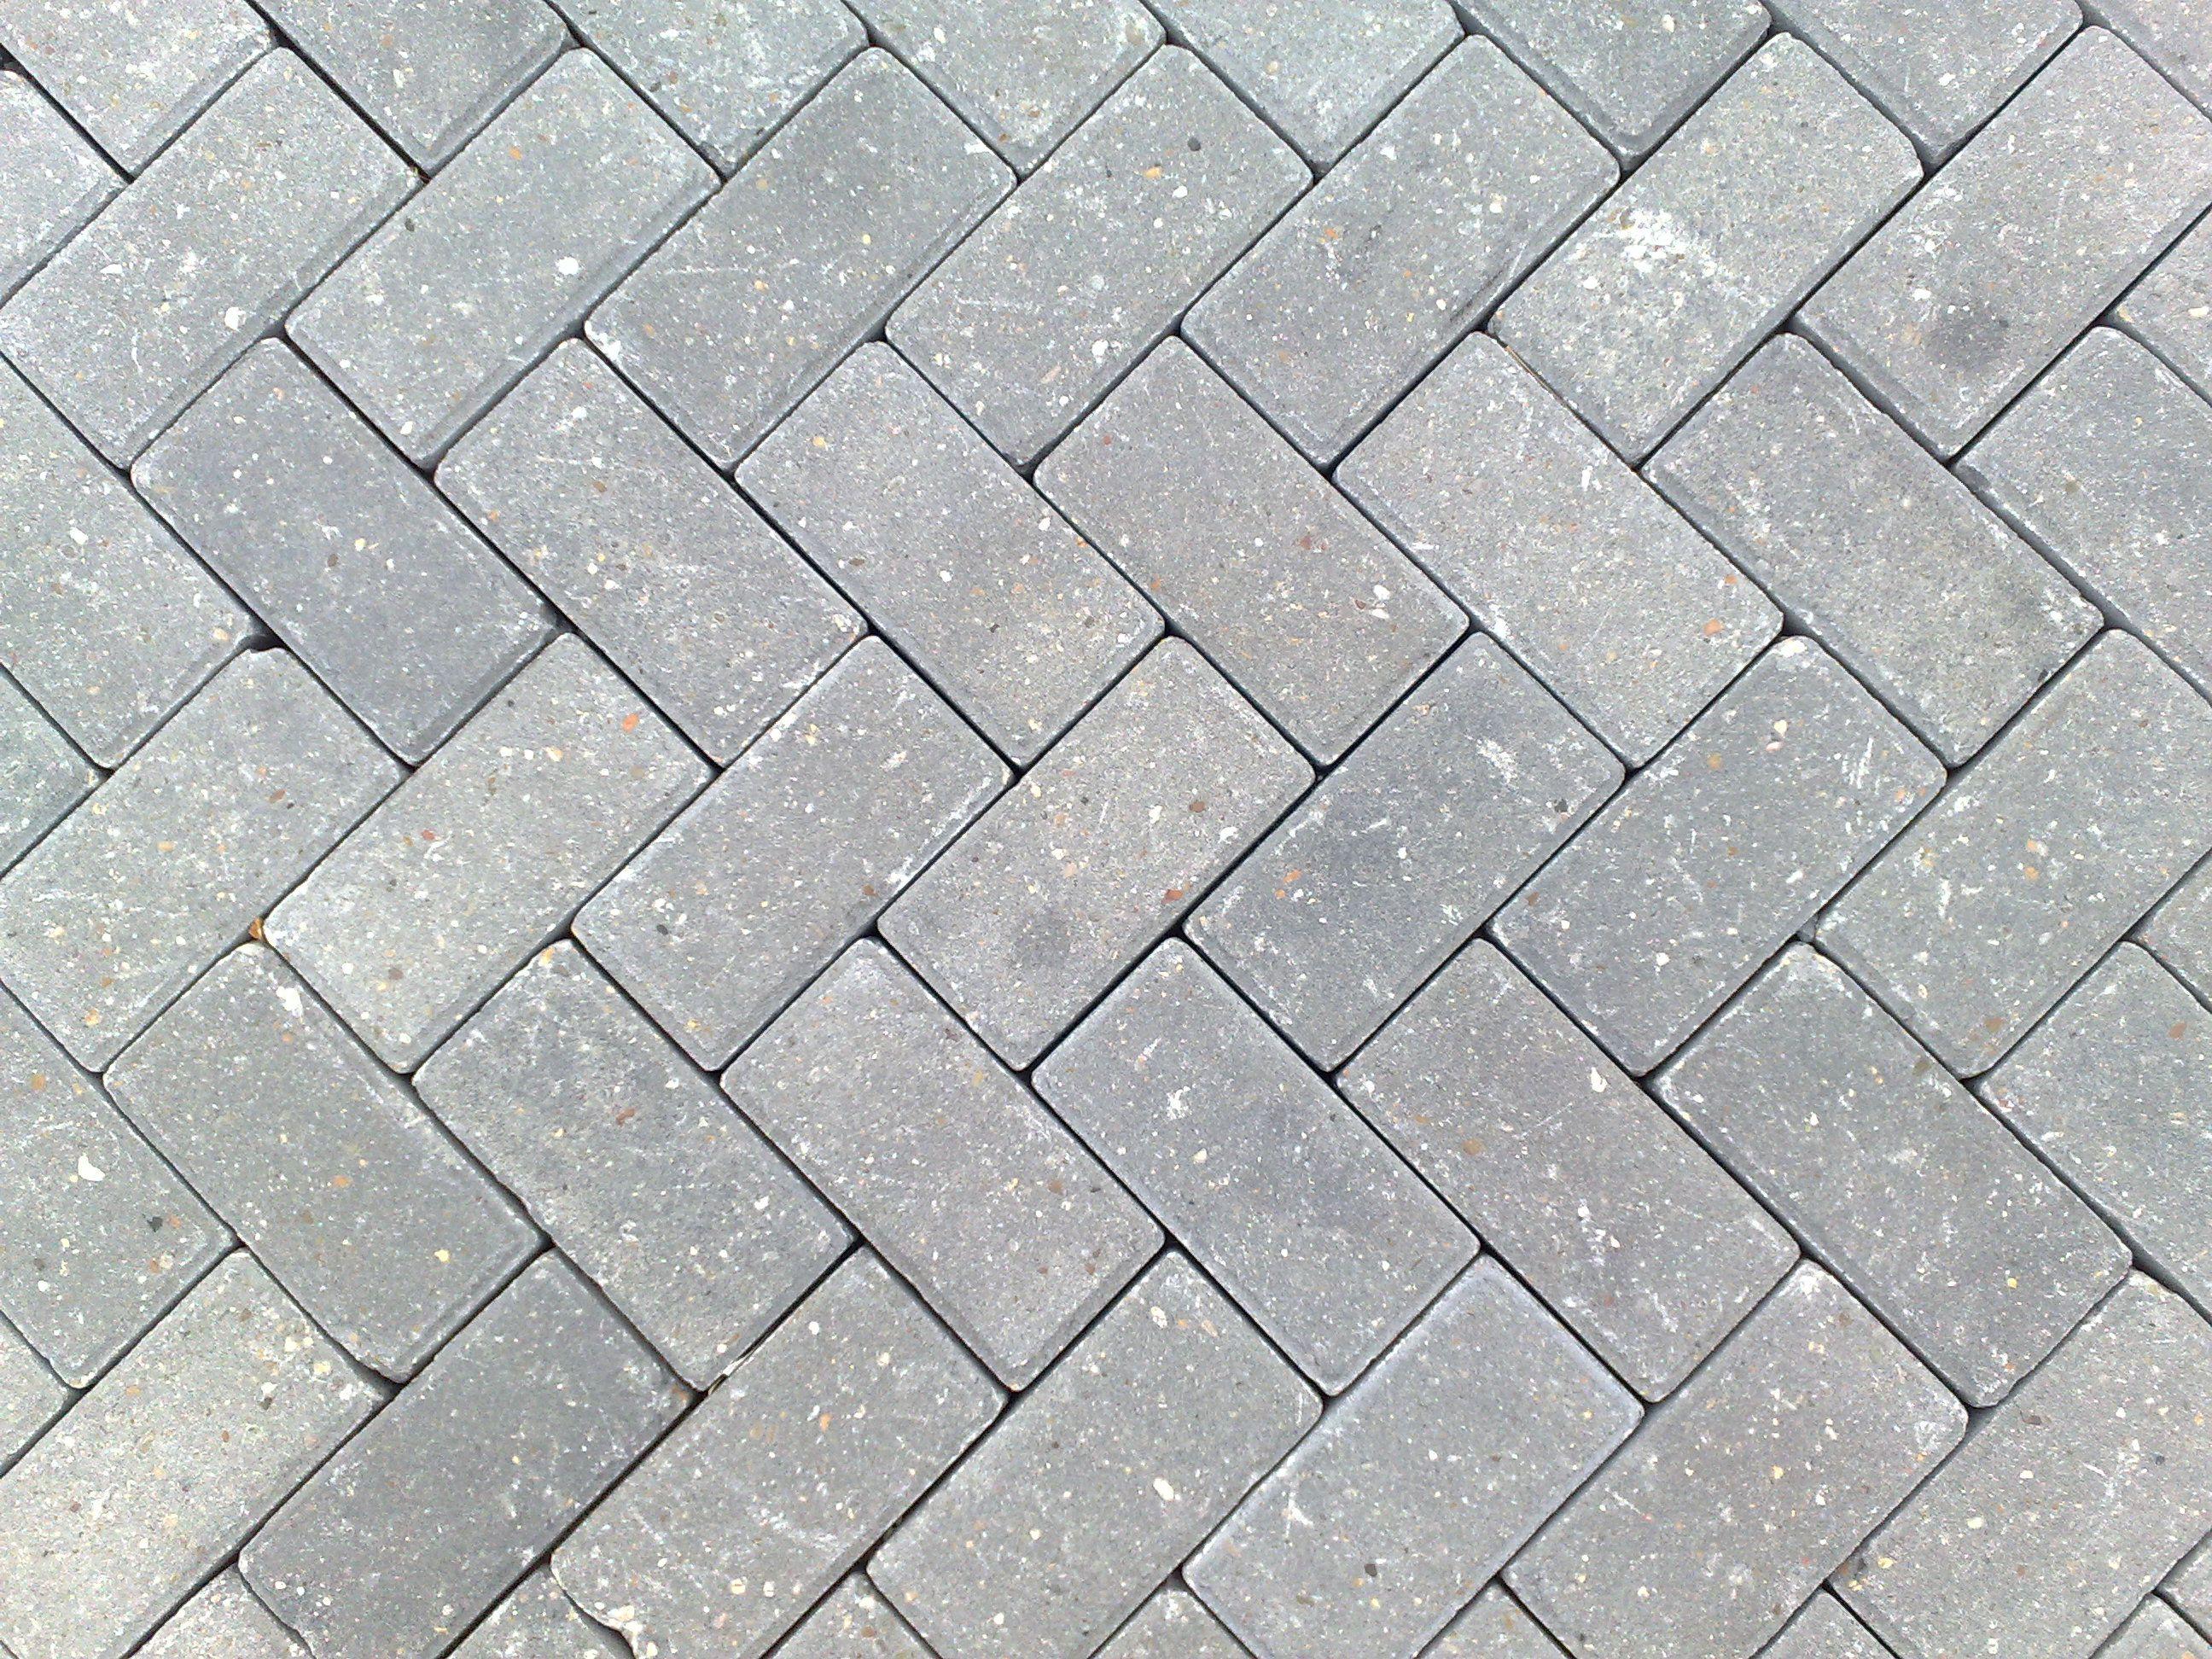 Textures architecture roads roads dirt road texture seamless - Black Metal Texture By Grungetextures On Deviantart